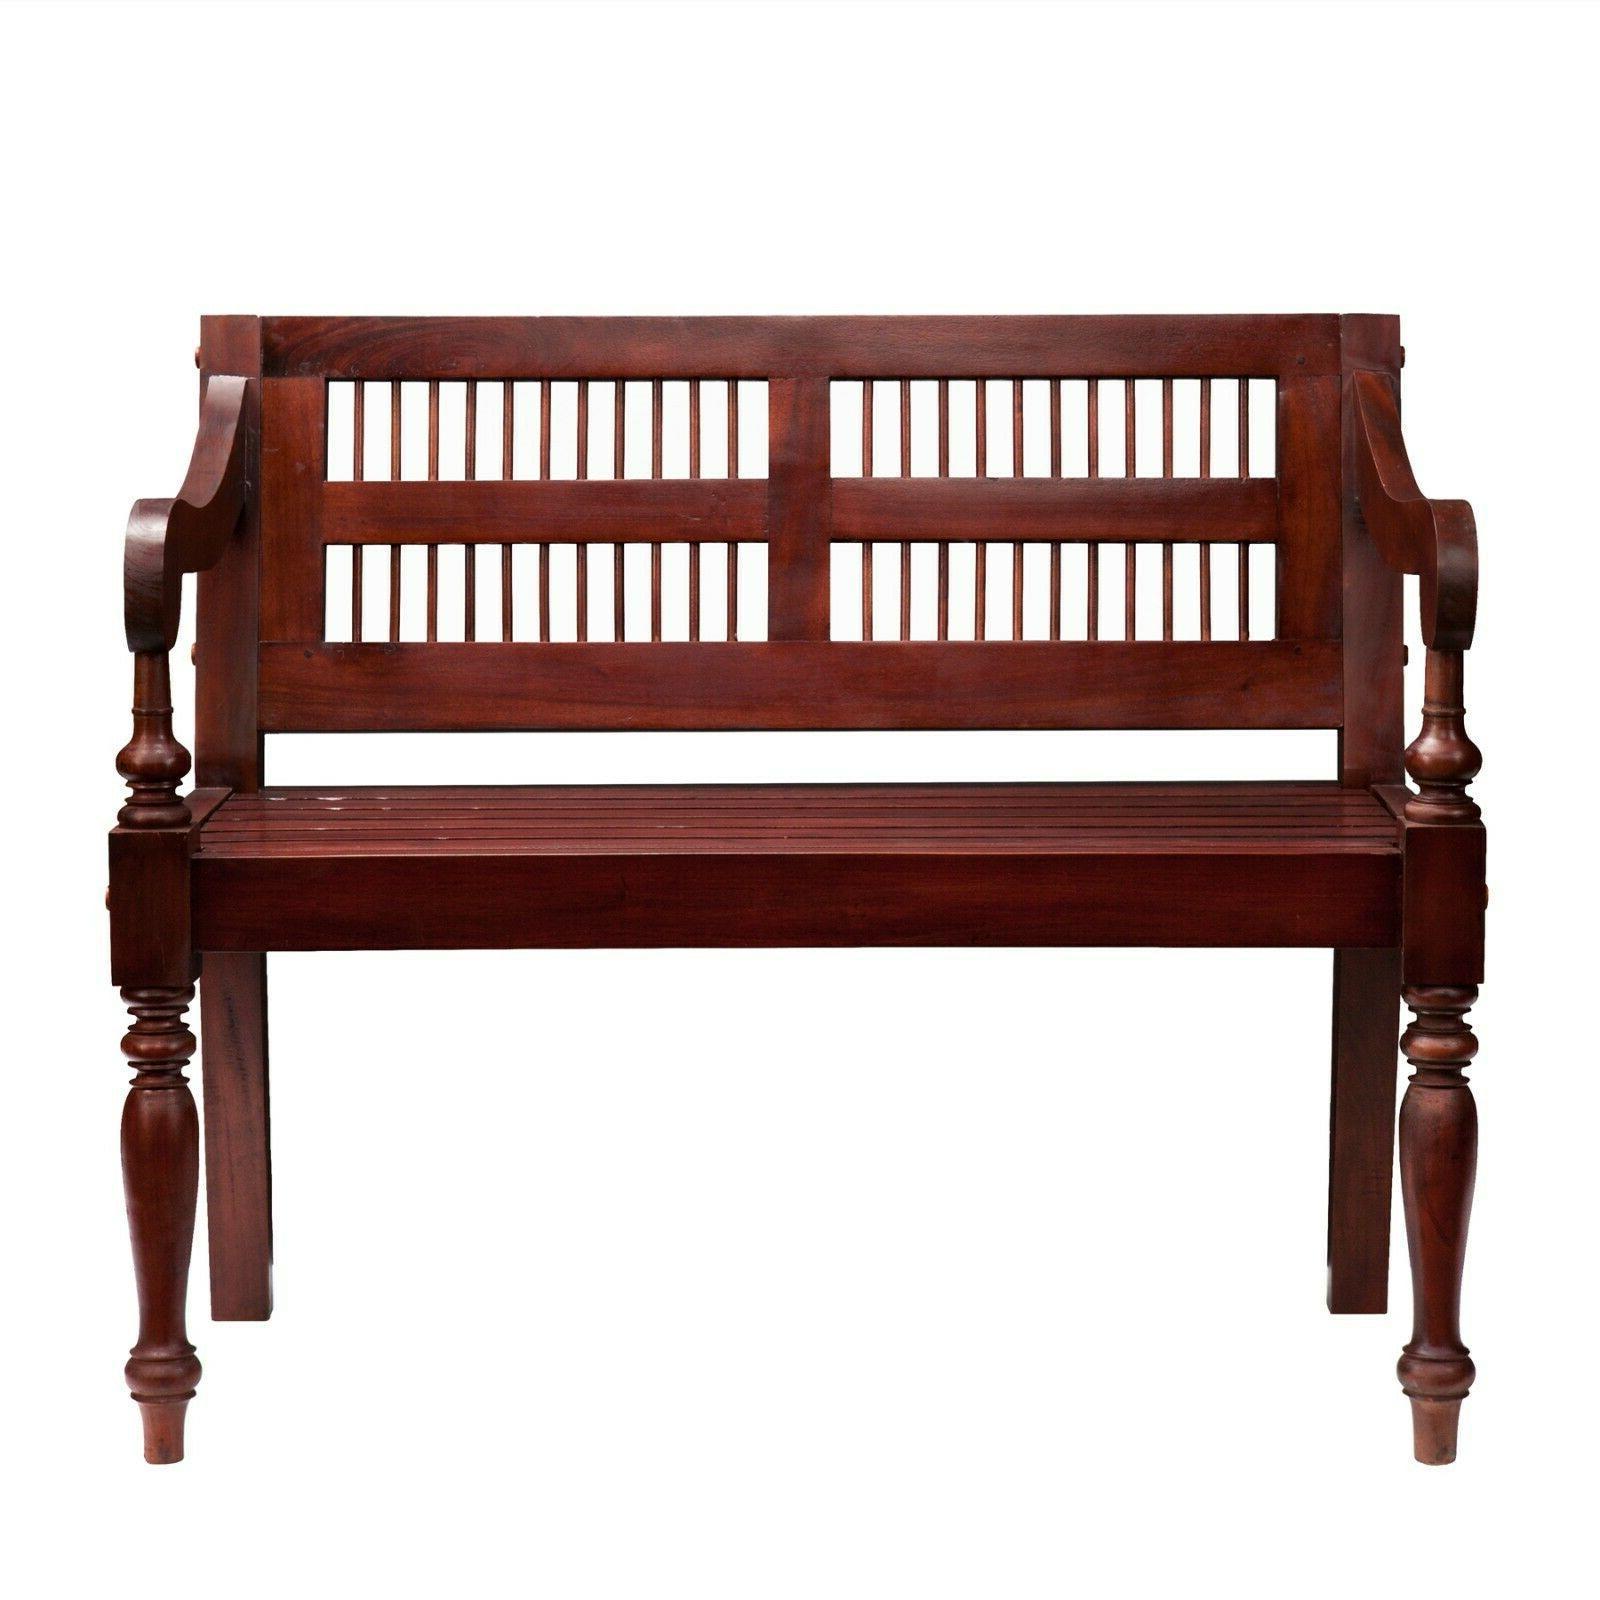 Wooden Mahogany Finish Wood Seat Traditional Entryway New